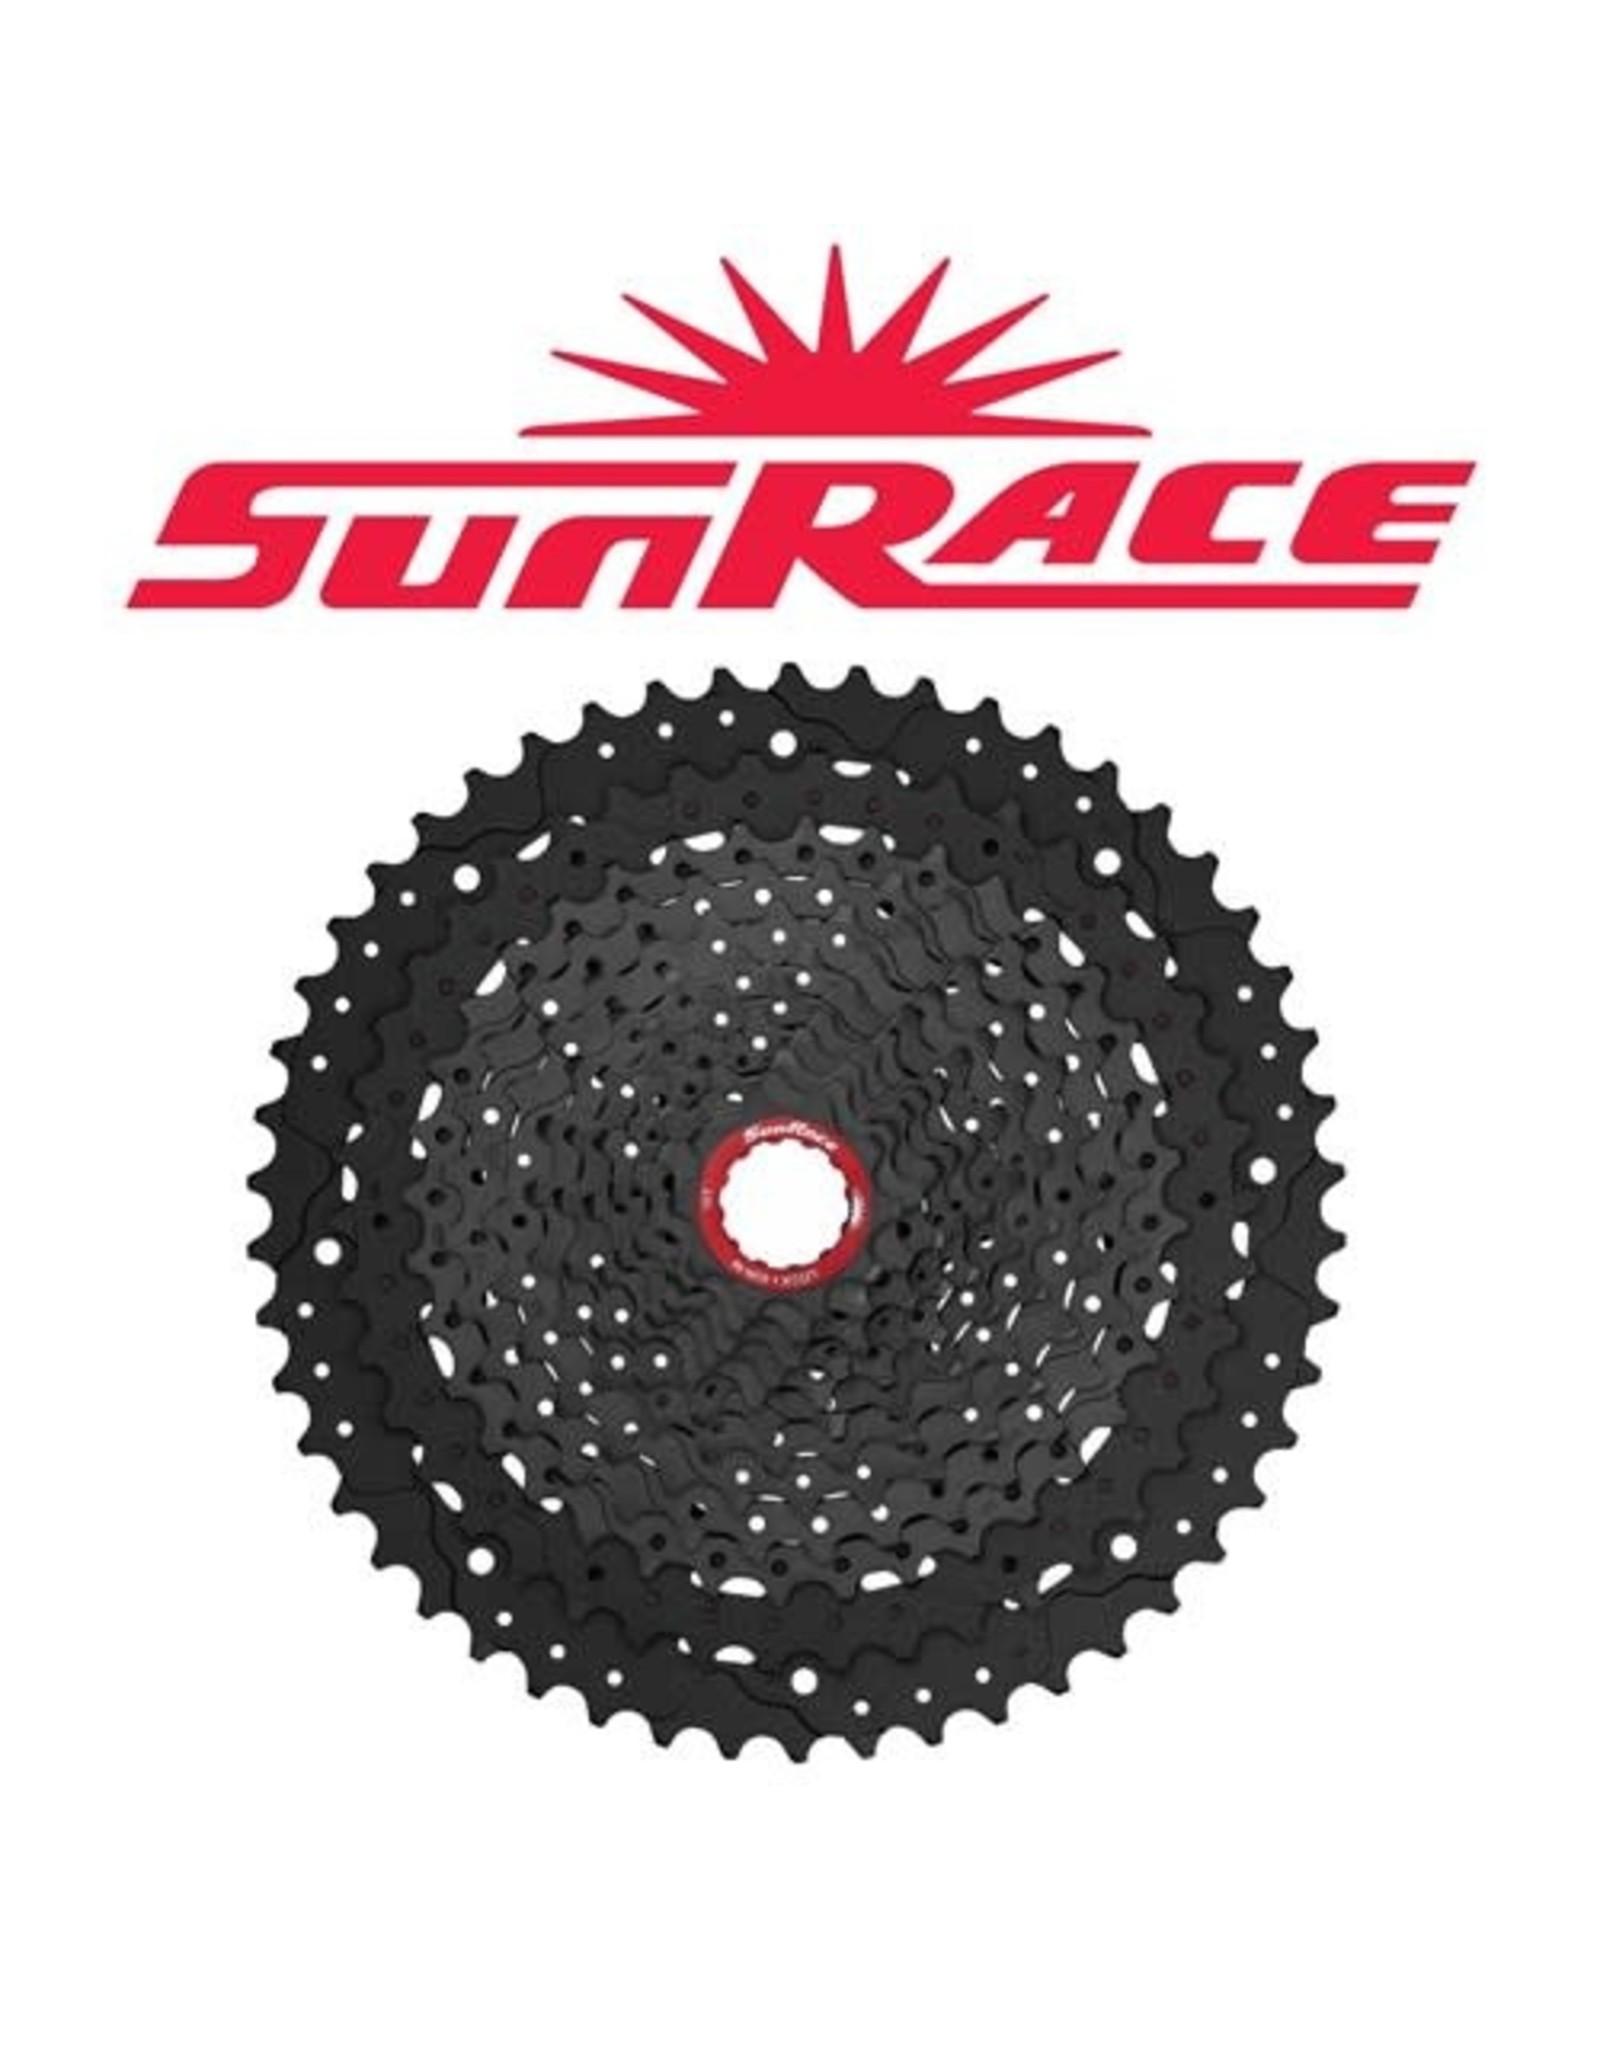 SUNRACE CASSETTE SUNRACE MZ91X 12 SPEED 11-50T BLACK SRAM XD COMPATIBLE